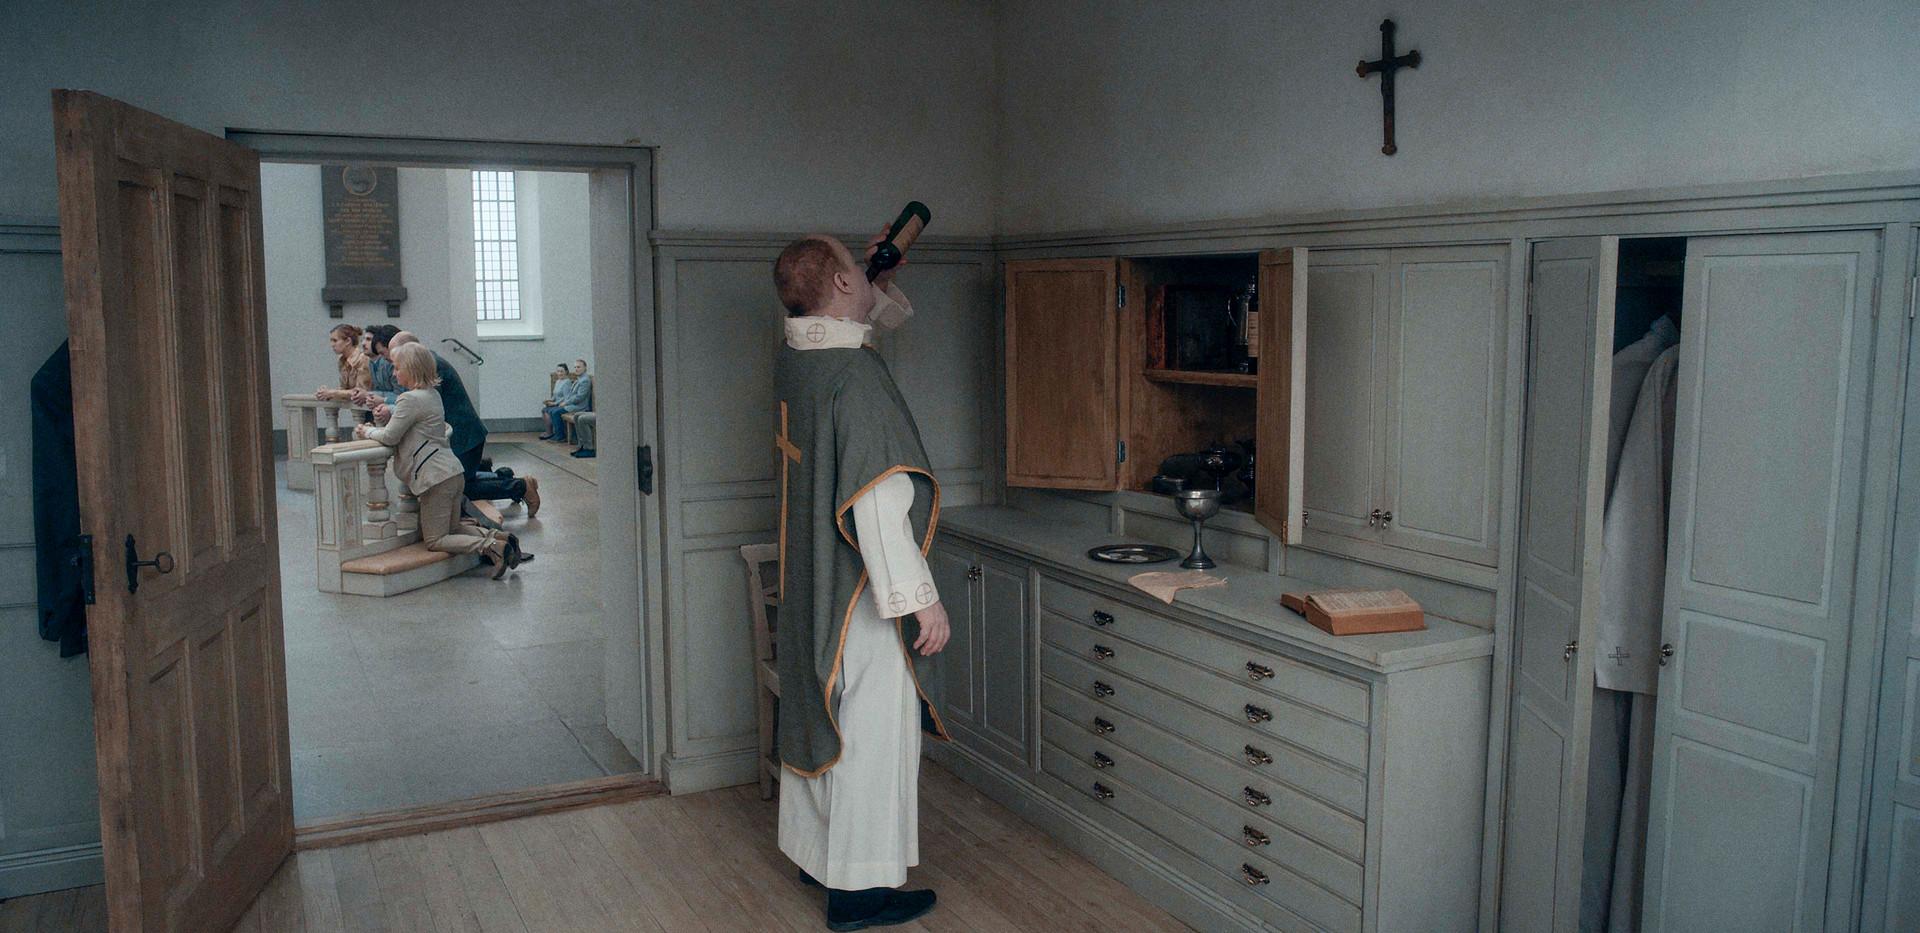 AboutEndlessness-Communion-2_Rec709G22-4